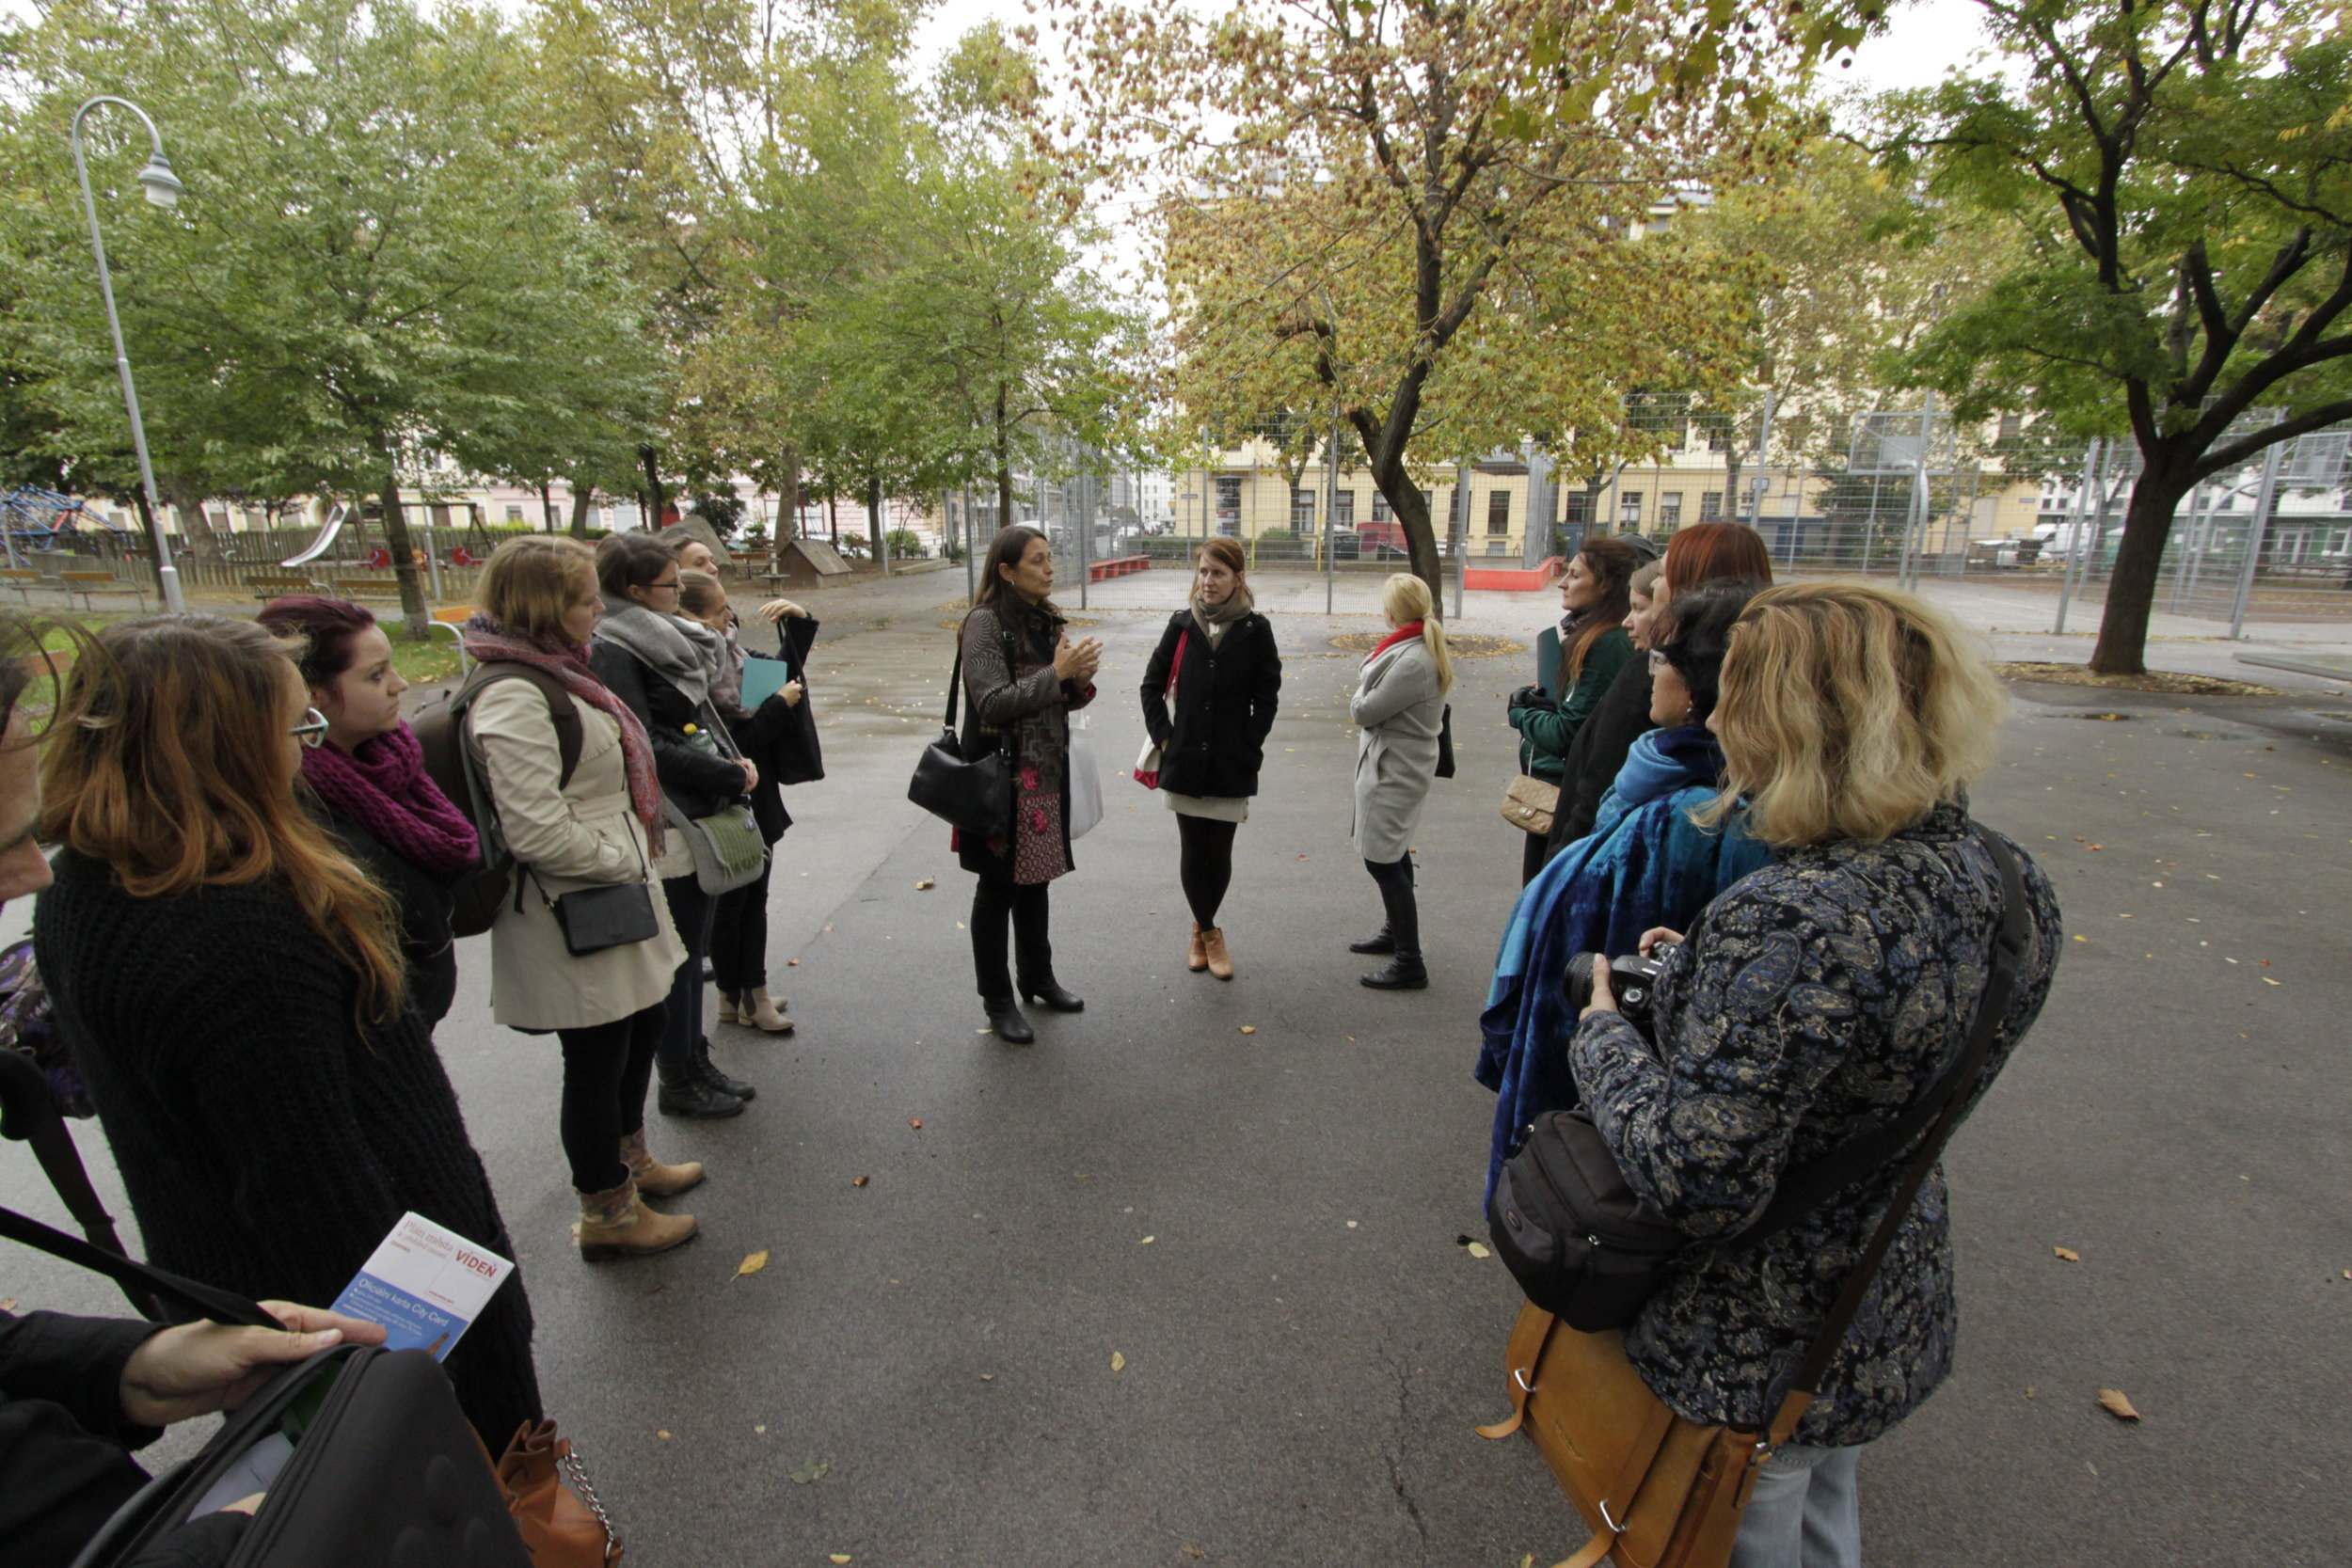 Claudia Prinz Brandenburg, landscape architect, Park Department of the City of Vienna explains the gender mainstreaming principles in Einsiedler park. Foto (c) Zdenka Lammelova